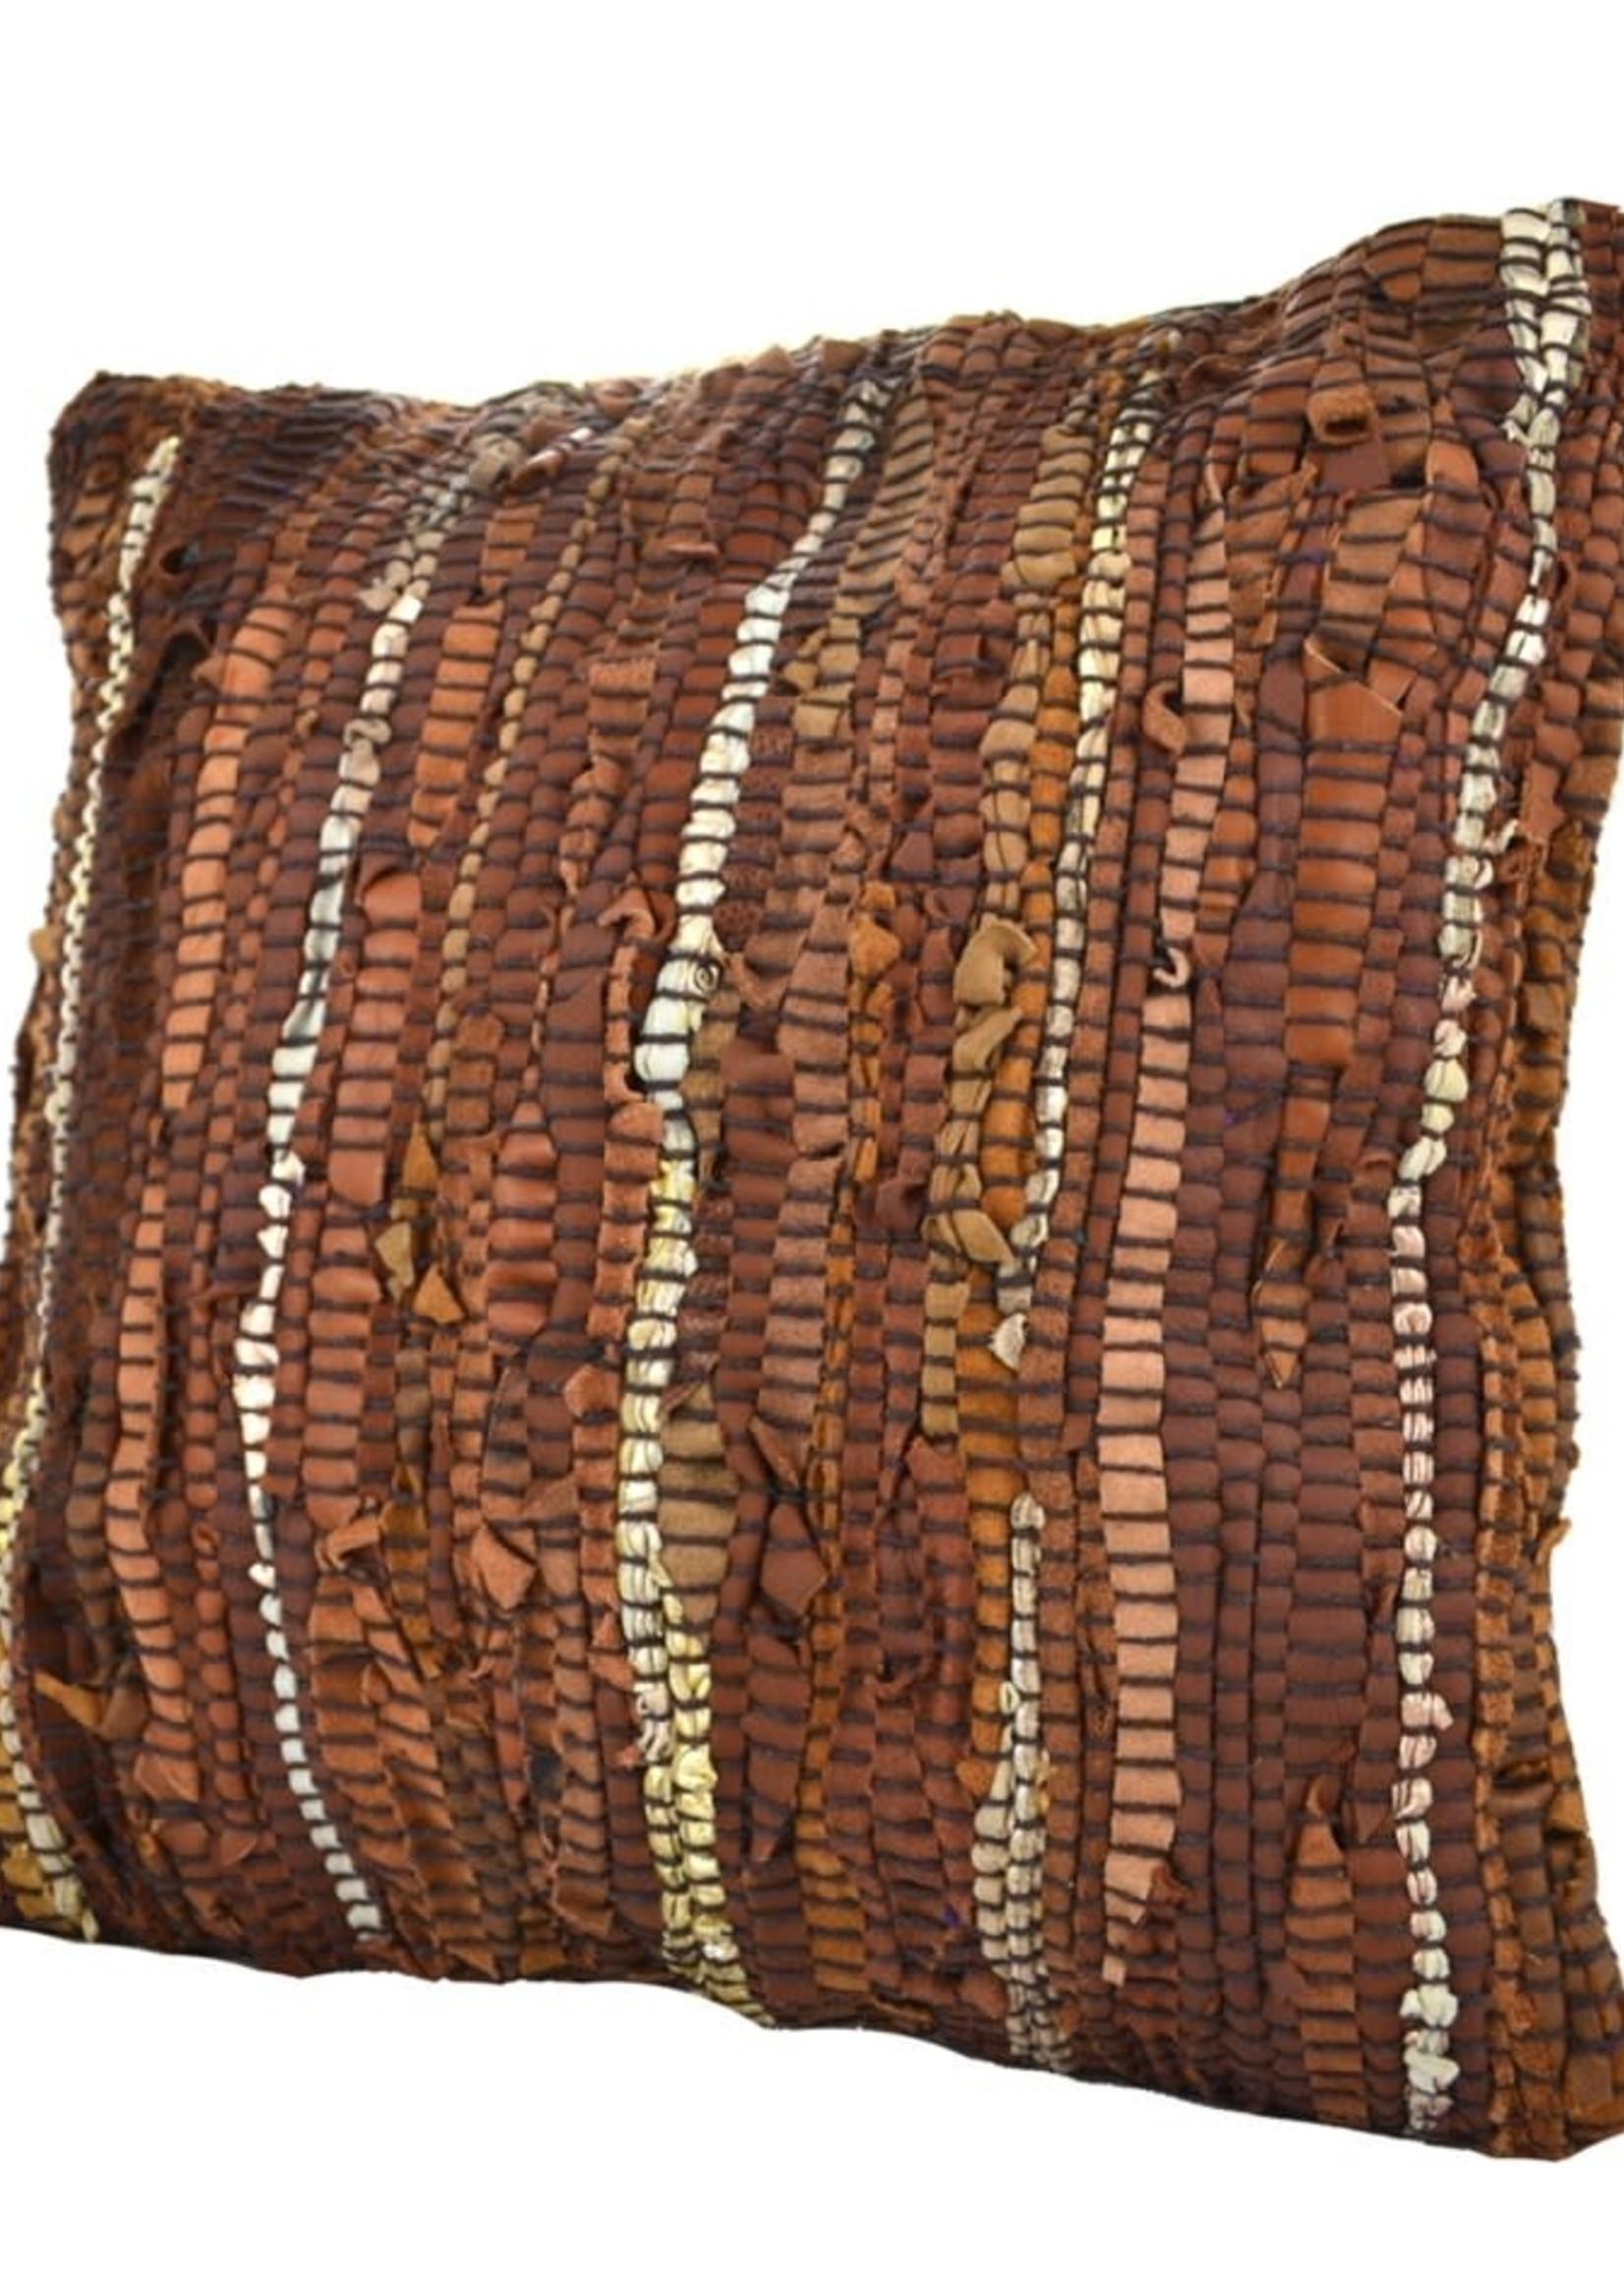 Nostalgia coussin cuir brun